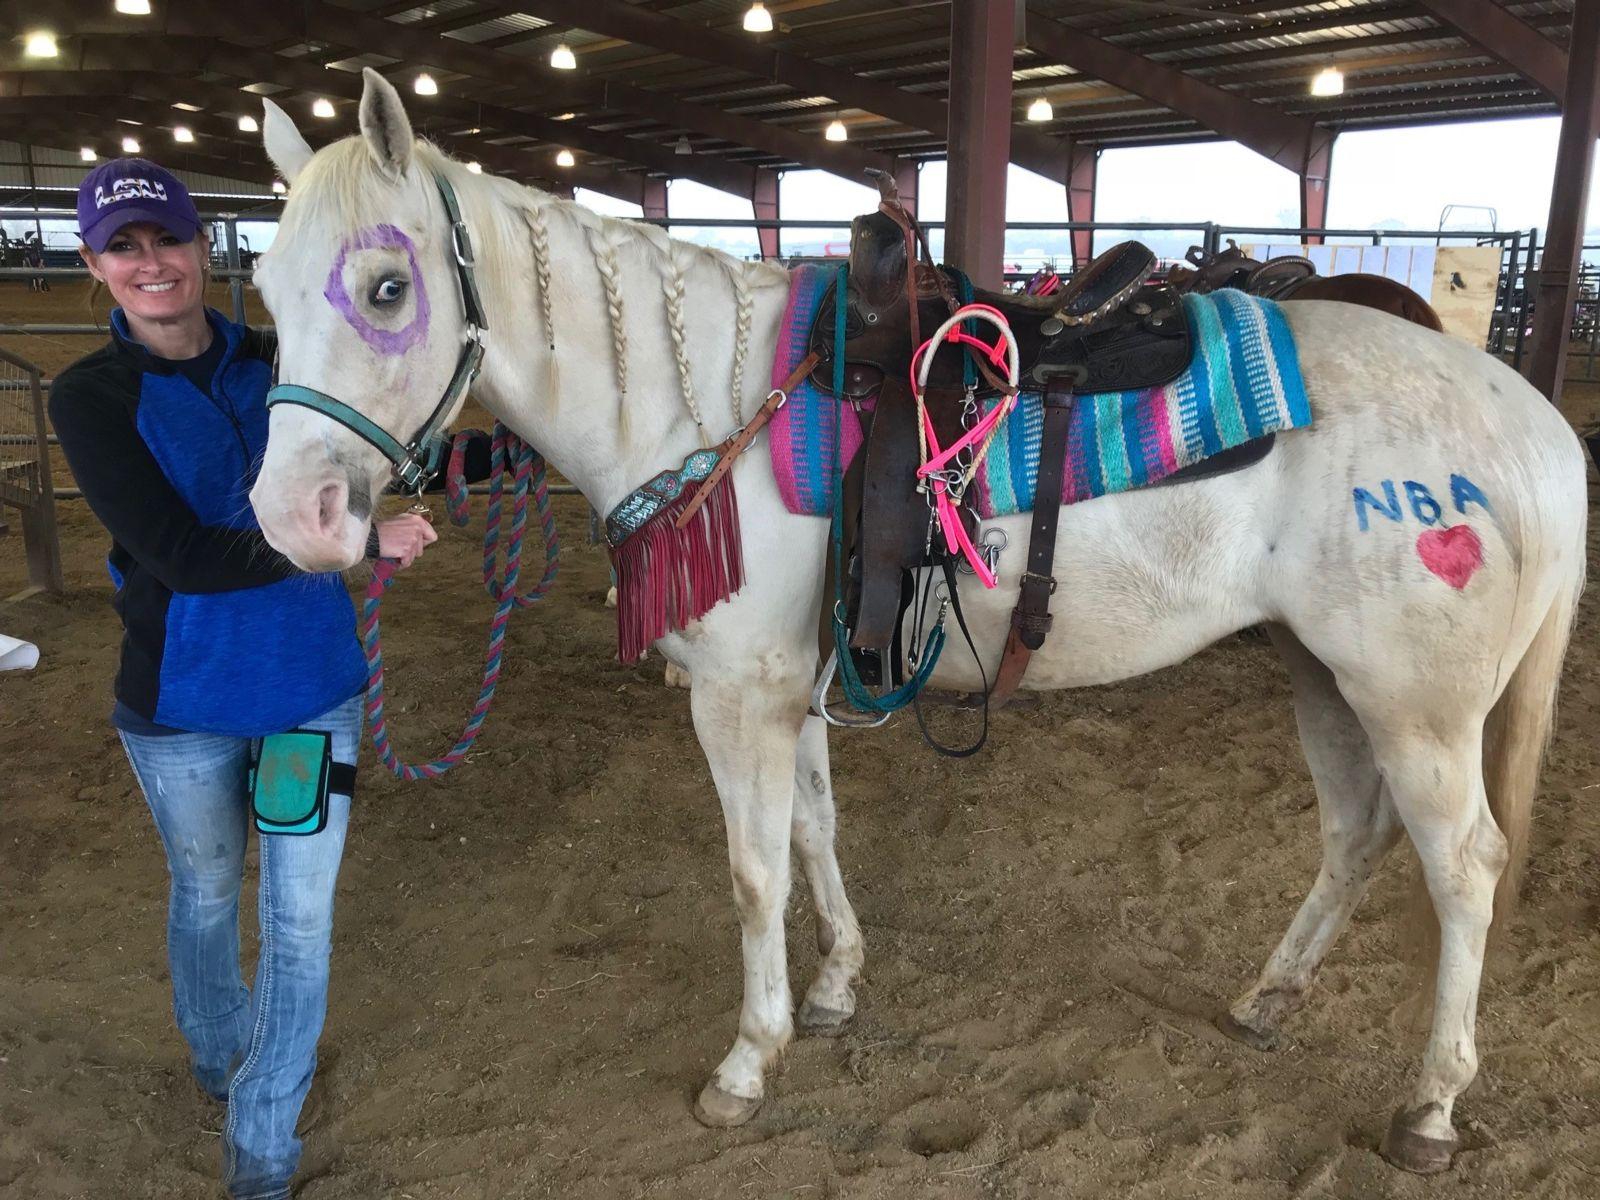 Lauren shows off her horse Blue's colorful finger paint.